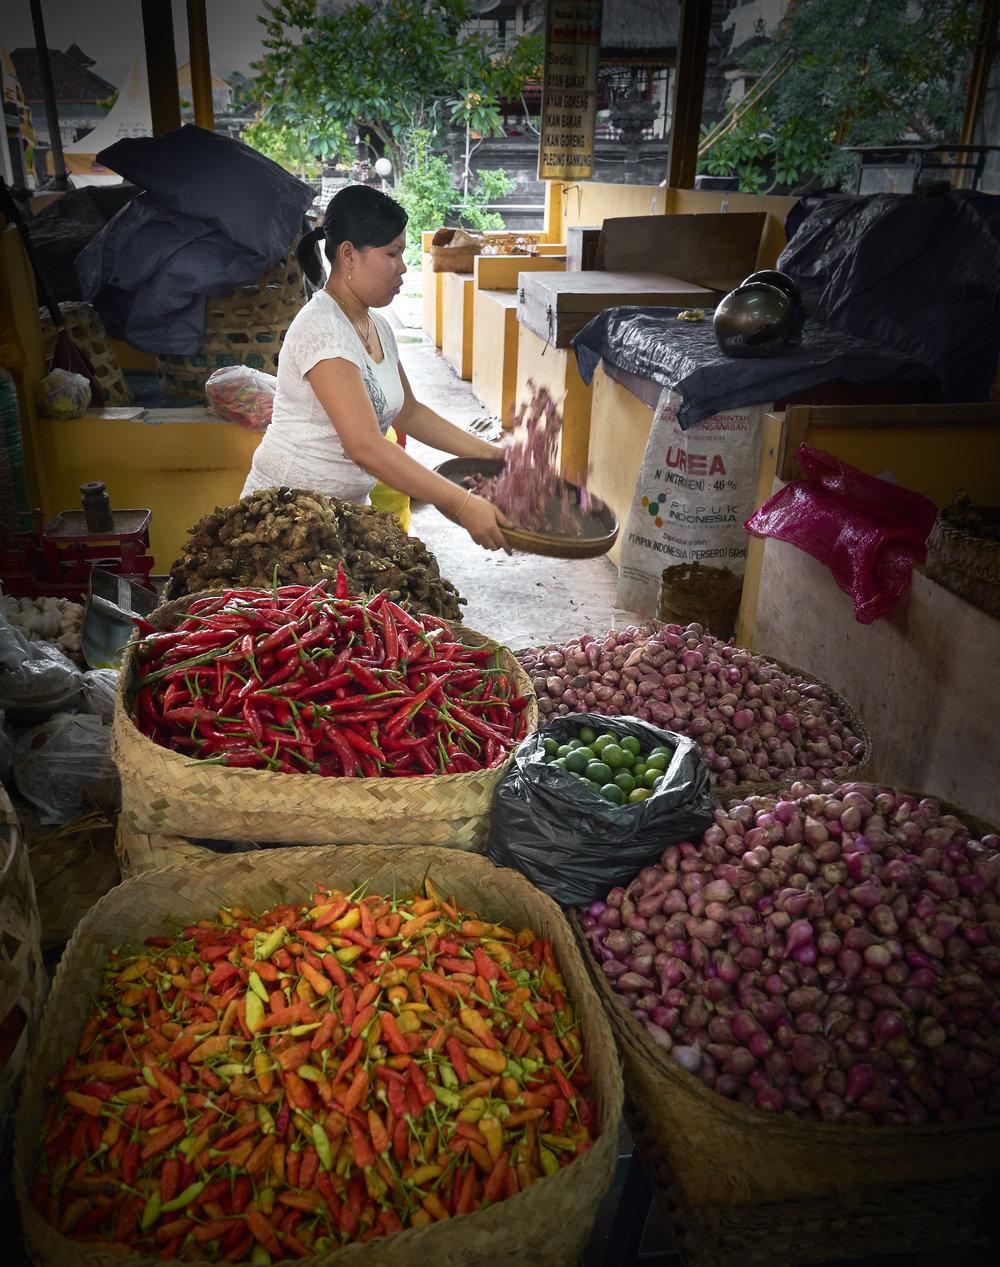 16-12-06-Bali-ILCE-7M2-0004.jpg